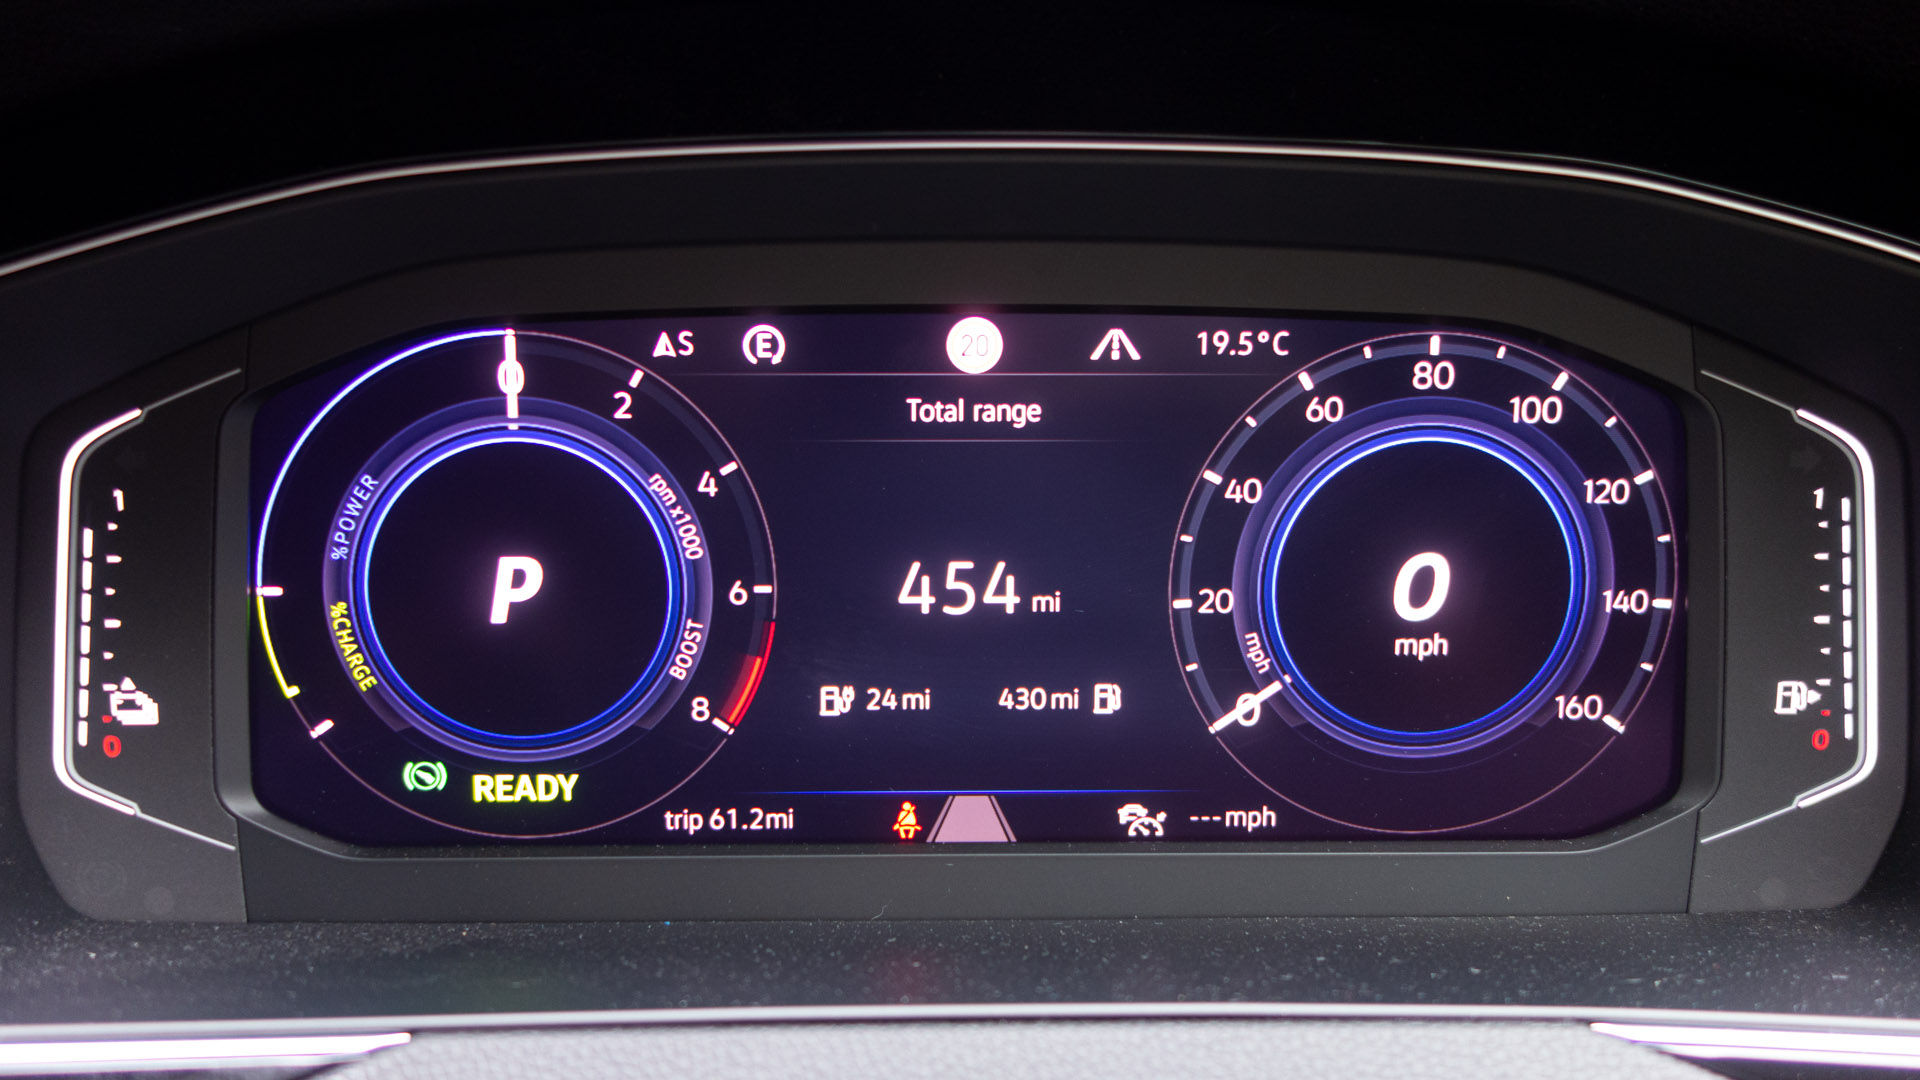 Volkswagen Passat Estate GTE instrument cluster